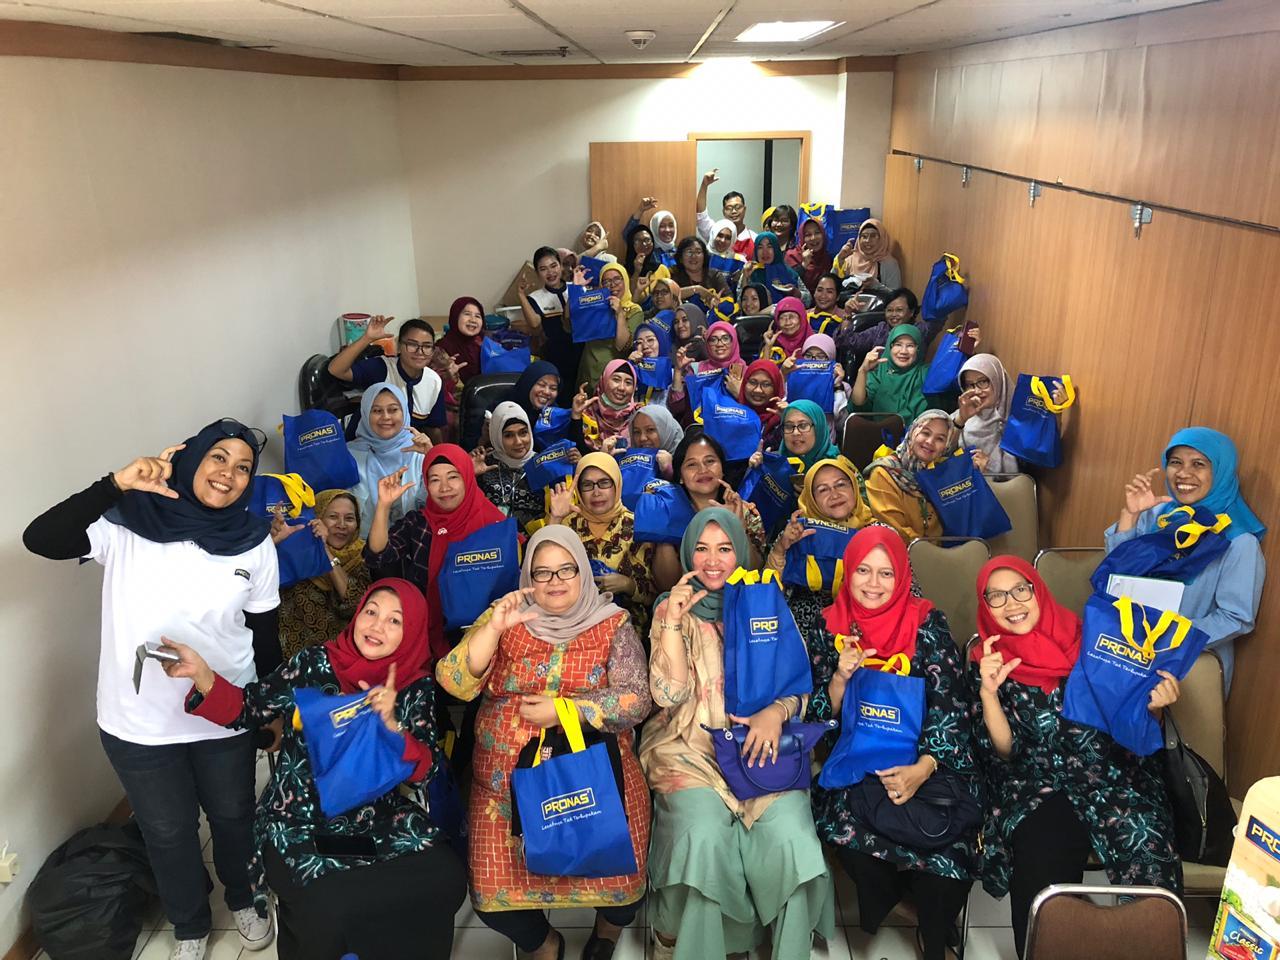 Dapoer Pronas Club bersama Dharma Wanita Yankes di Kementerian Kesehatan - Jakarta